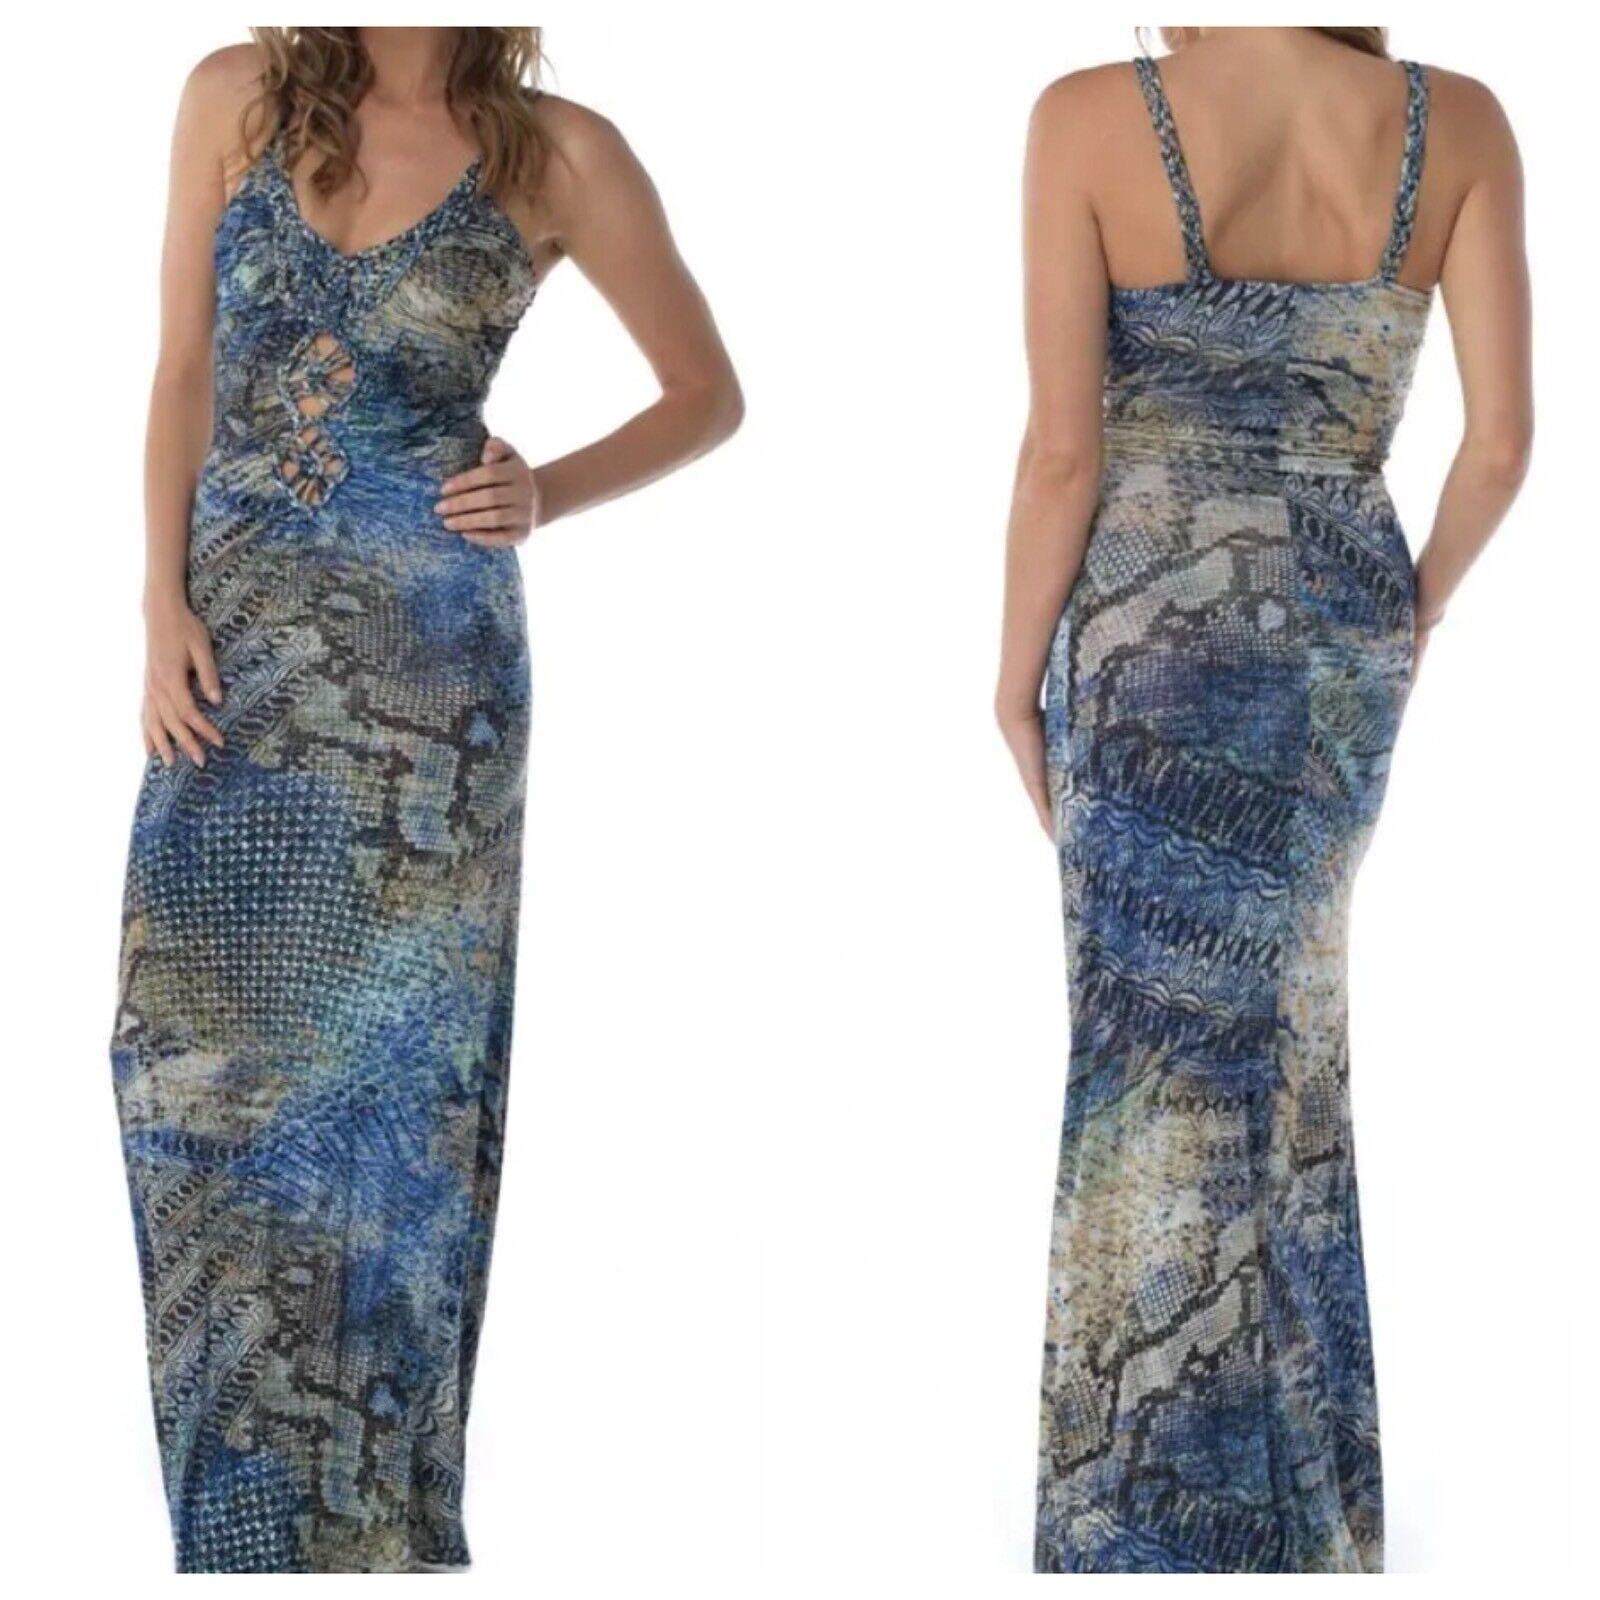 Sky Brand S Cobalt Blau Cut Out MAHER Maxi Dress--Small